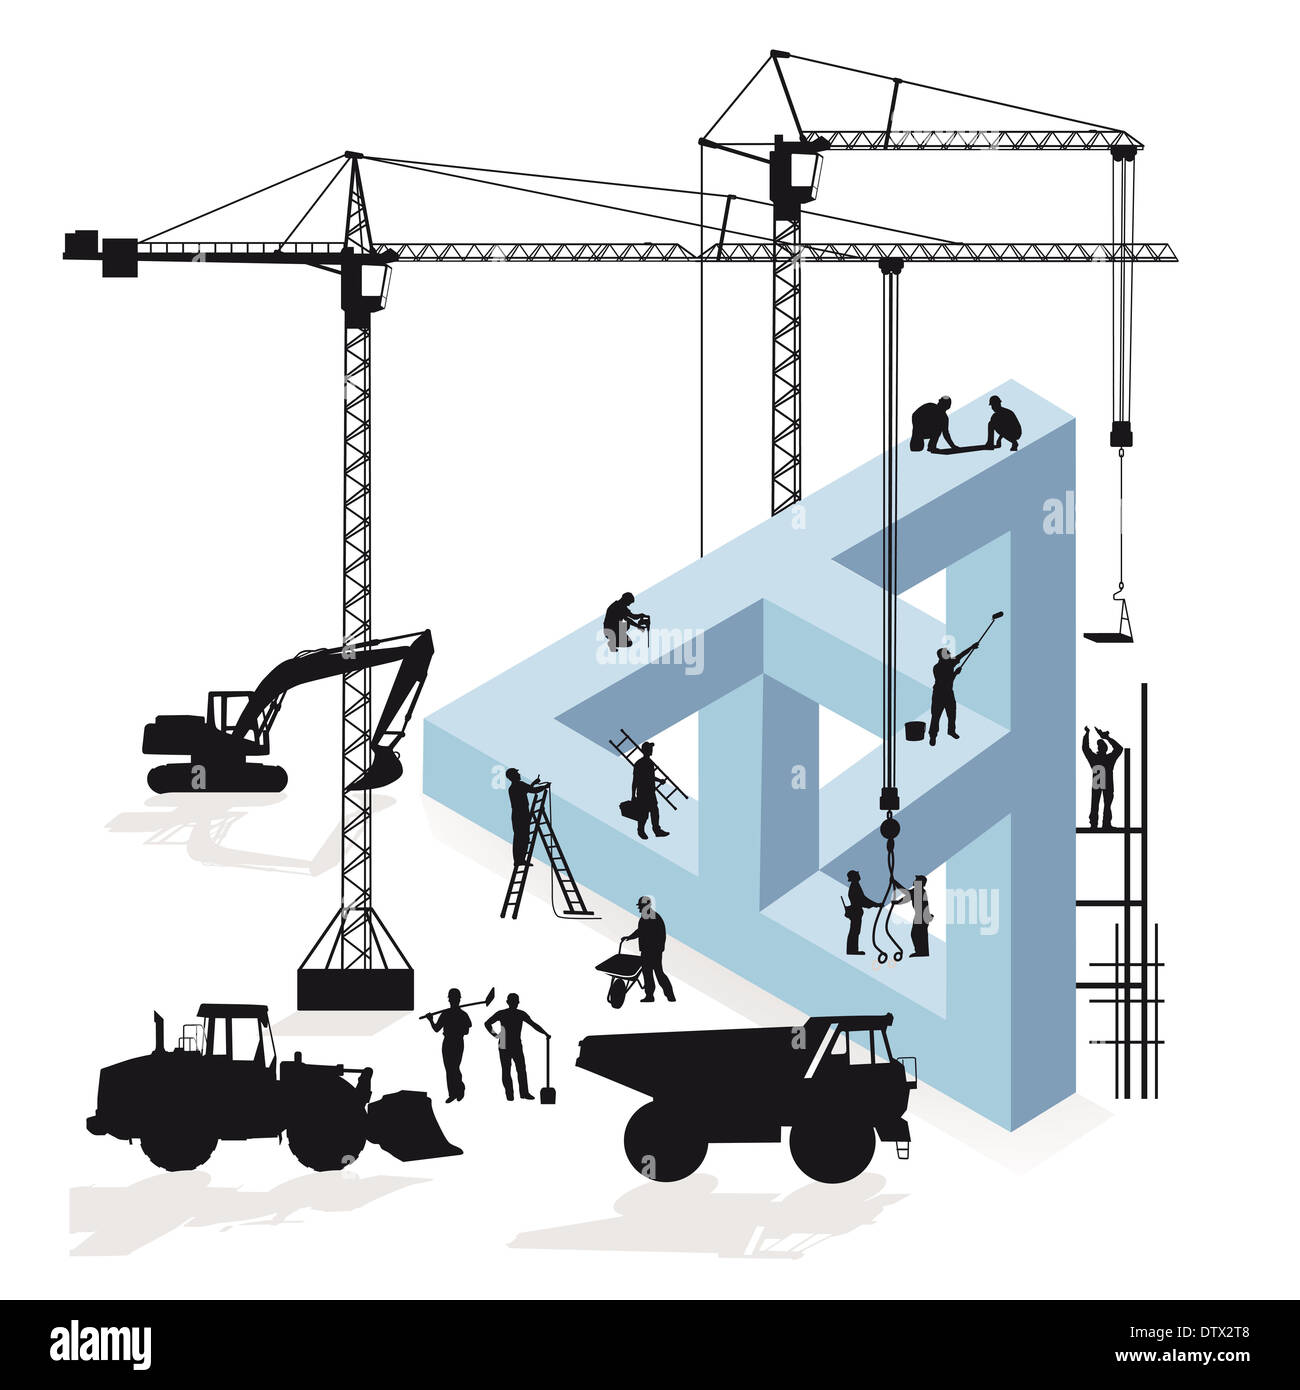 Magination Construction - Stock Image